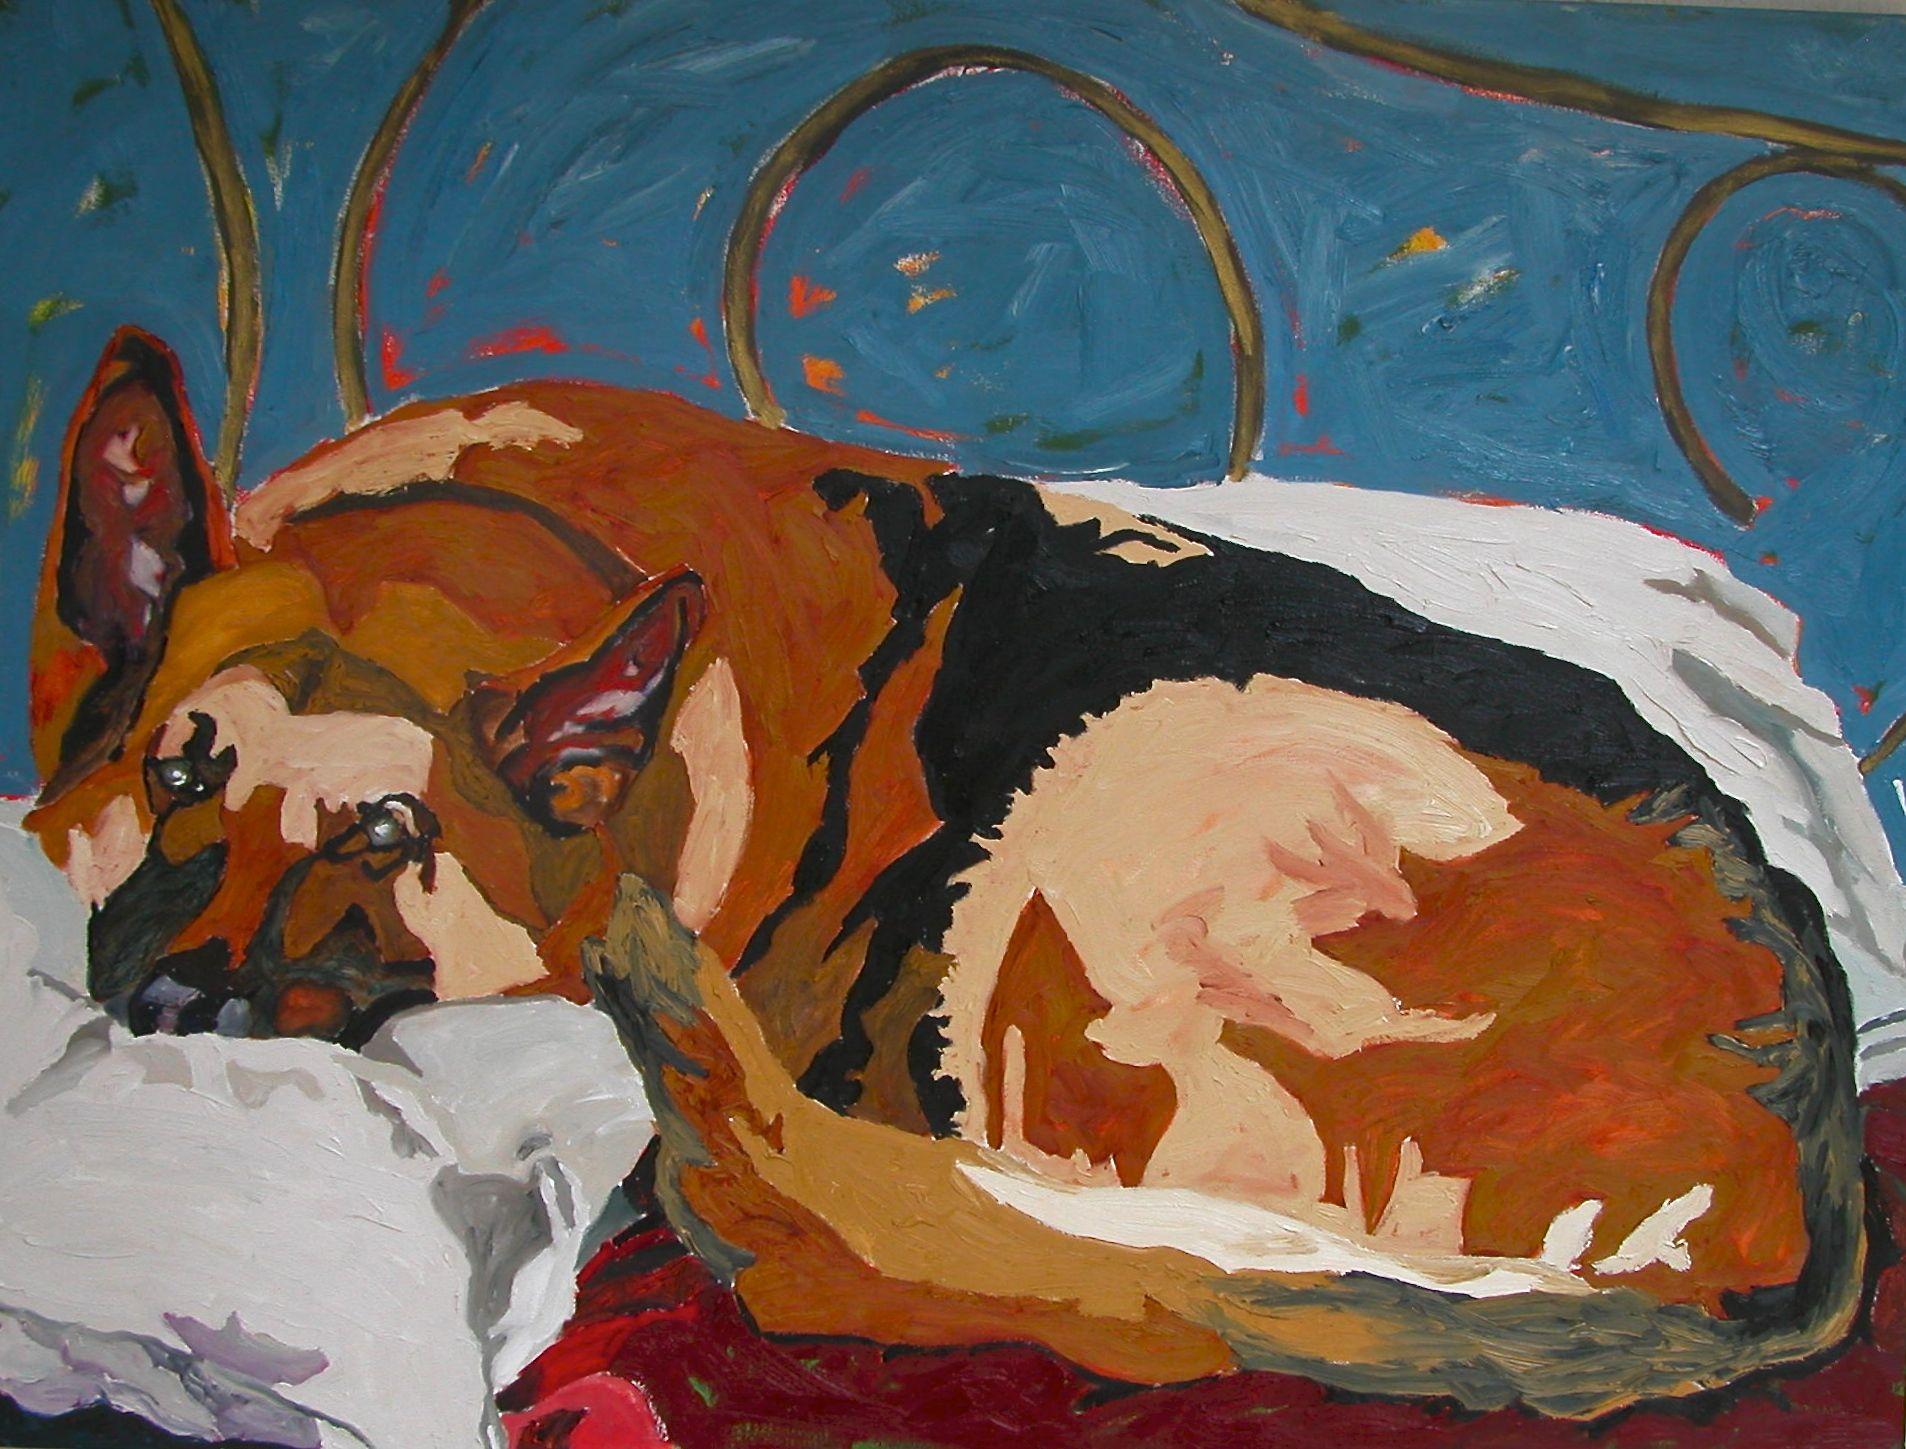 Let Sleeping Dogs Lie #3